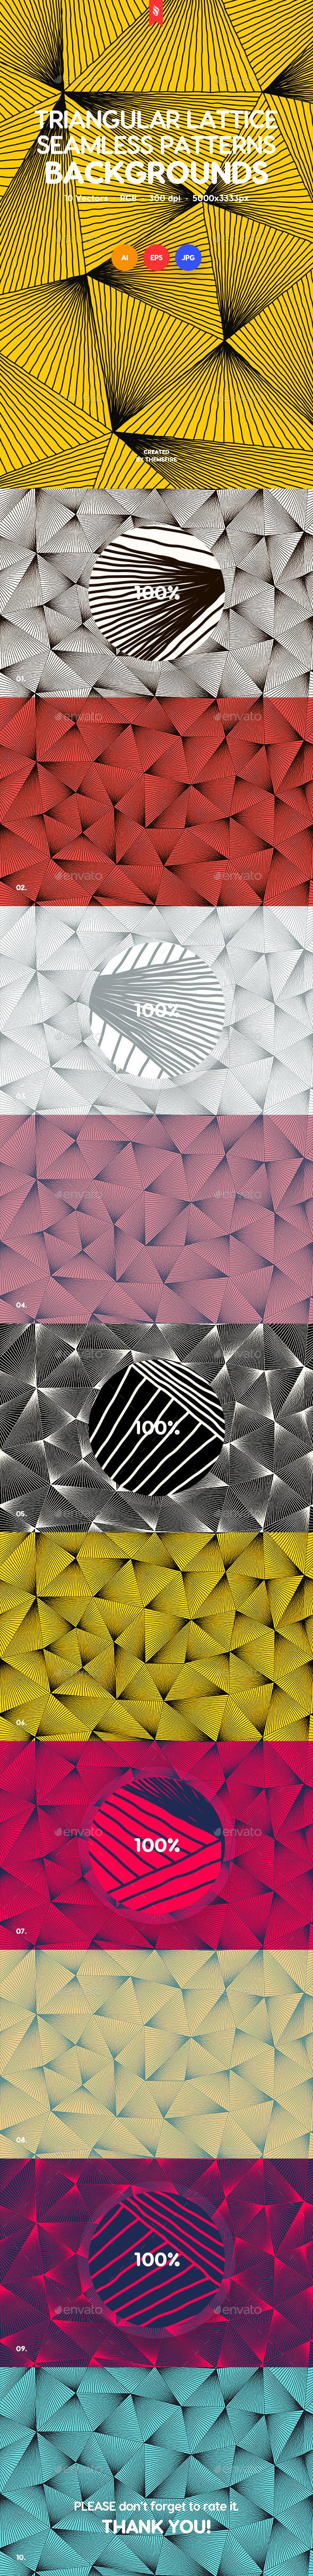 Wavy Triangular Lattice Seamless Patterns / Backgrounds - Patterns Backgrounds